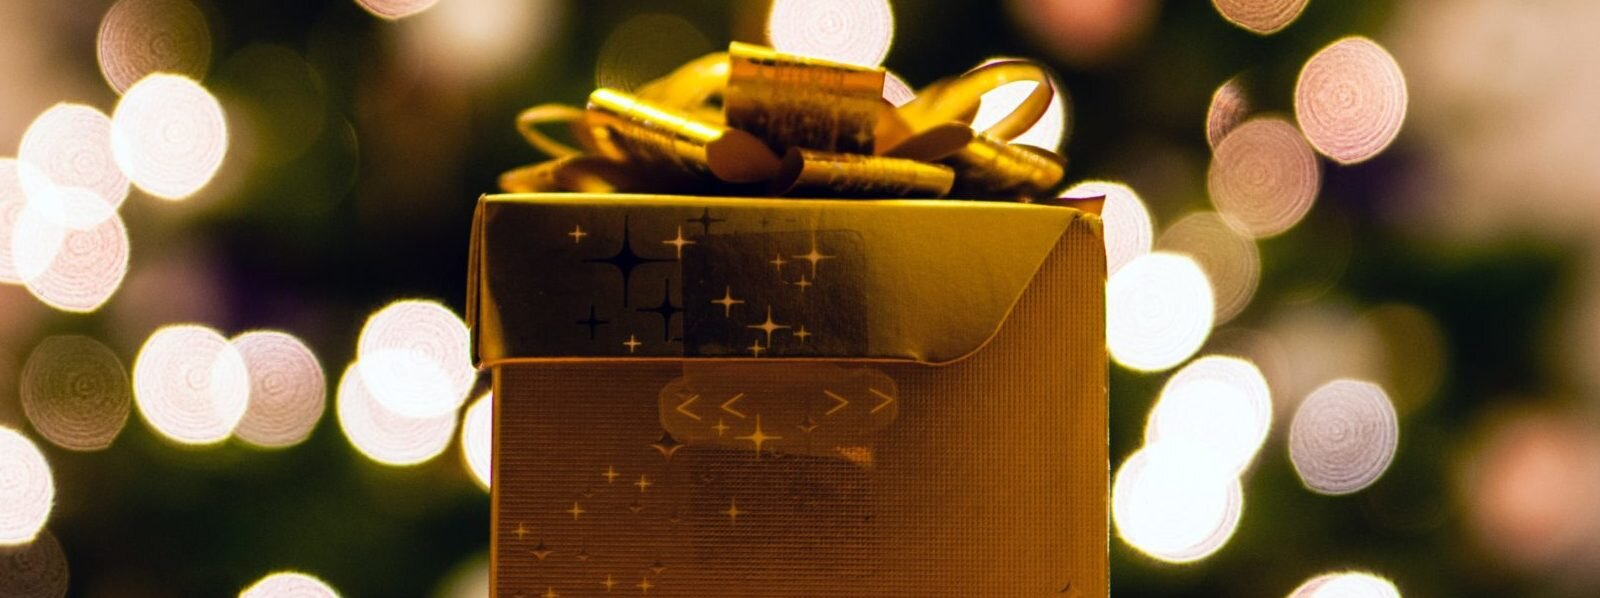 bokeh-christmas-christmas-wallpaper-76931-e1542650126953-1600x598.jpg